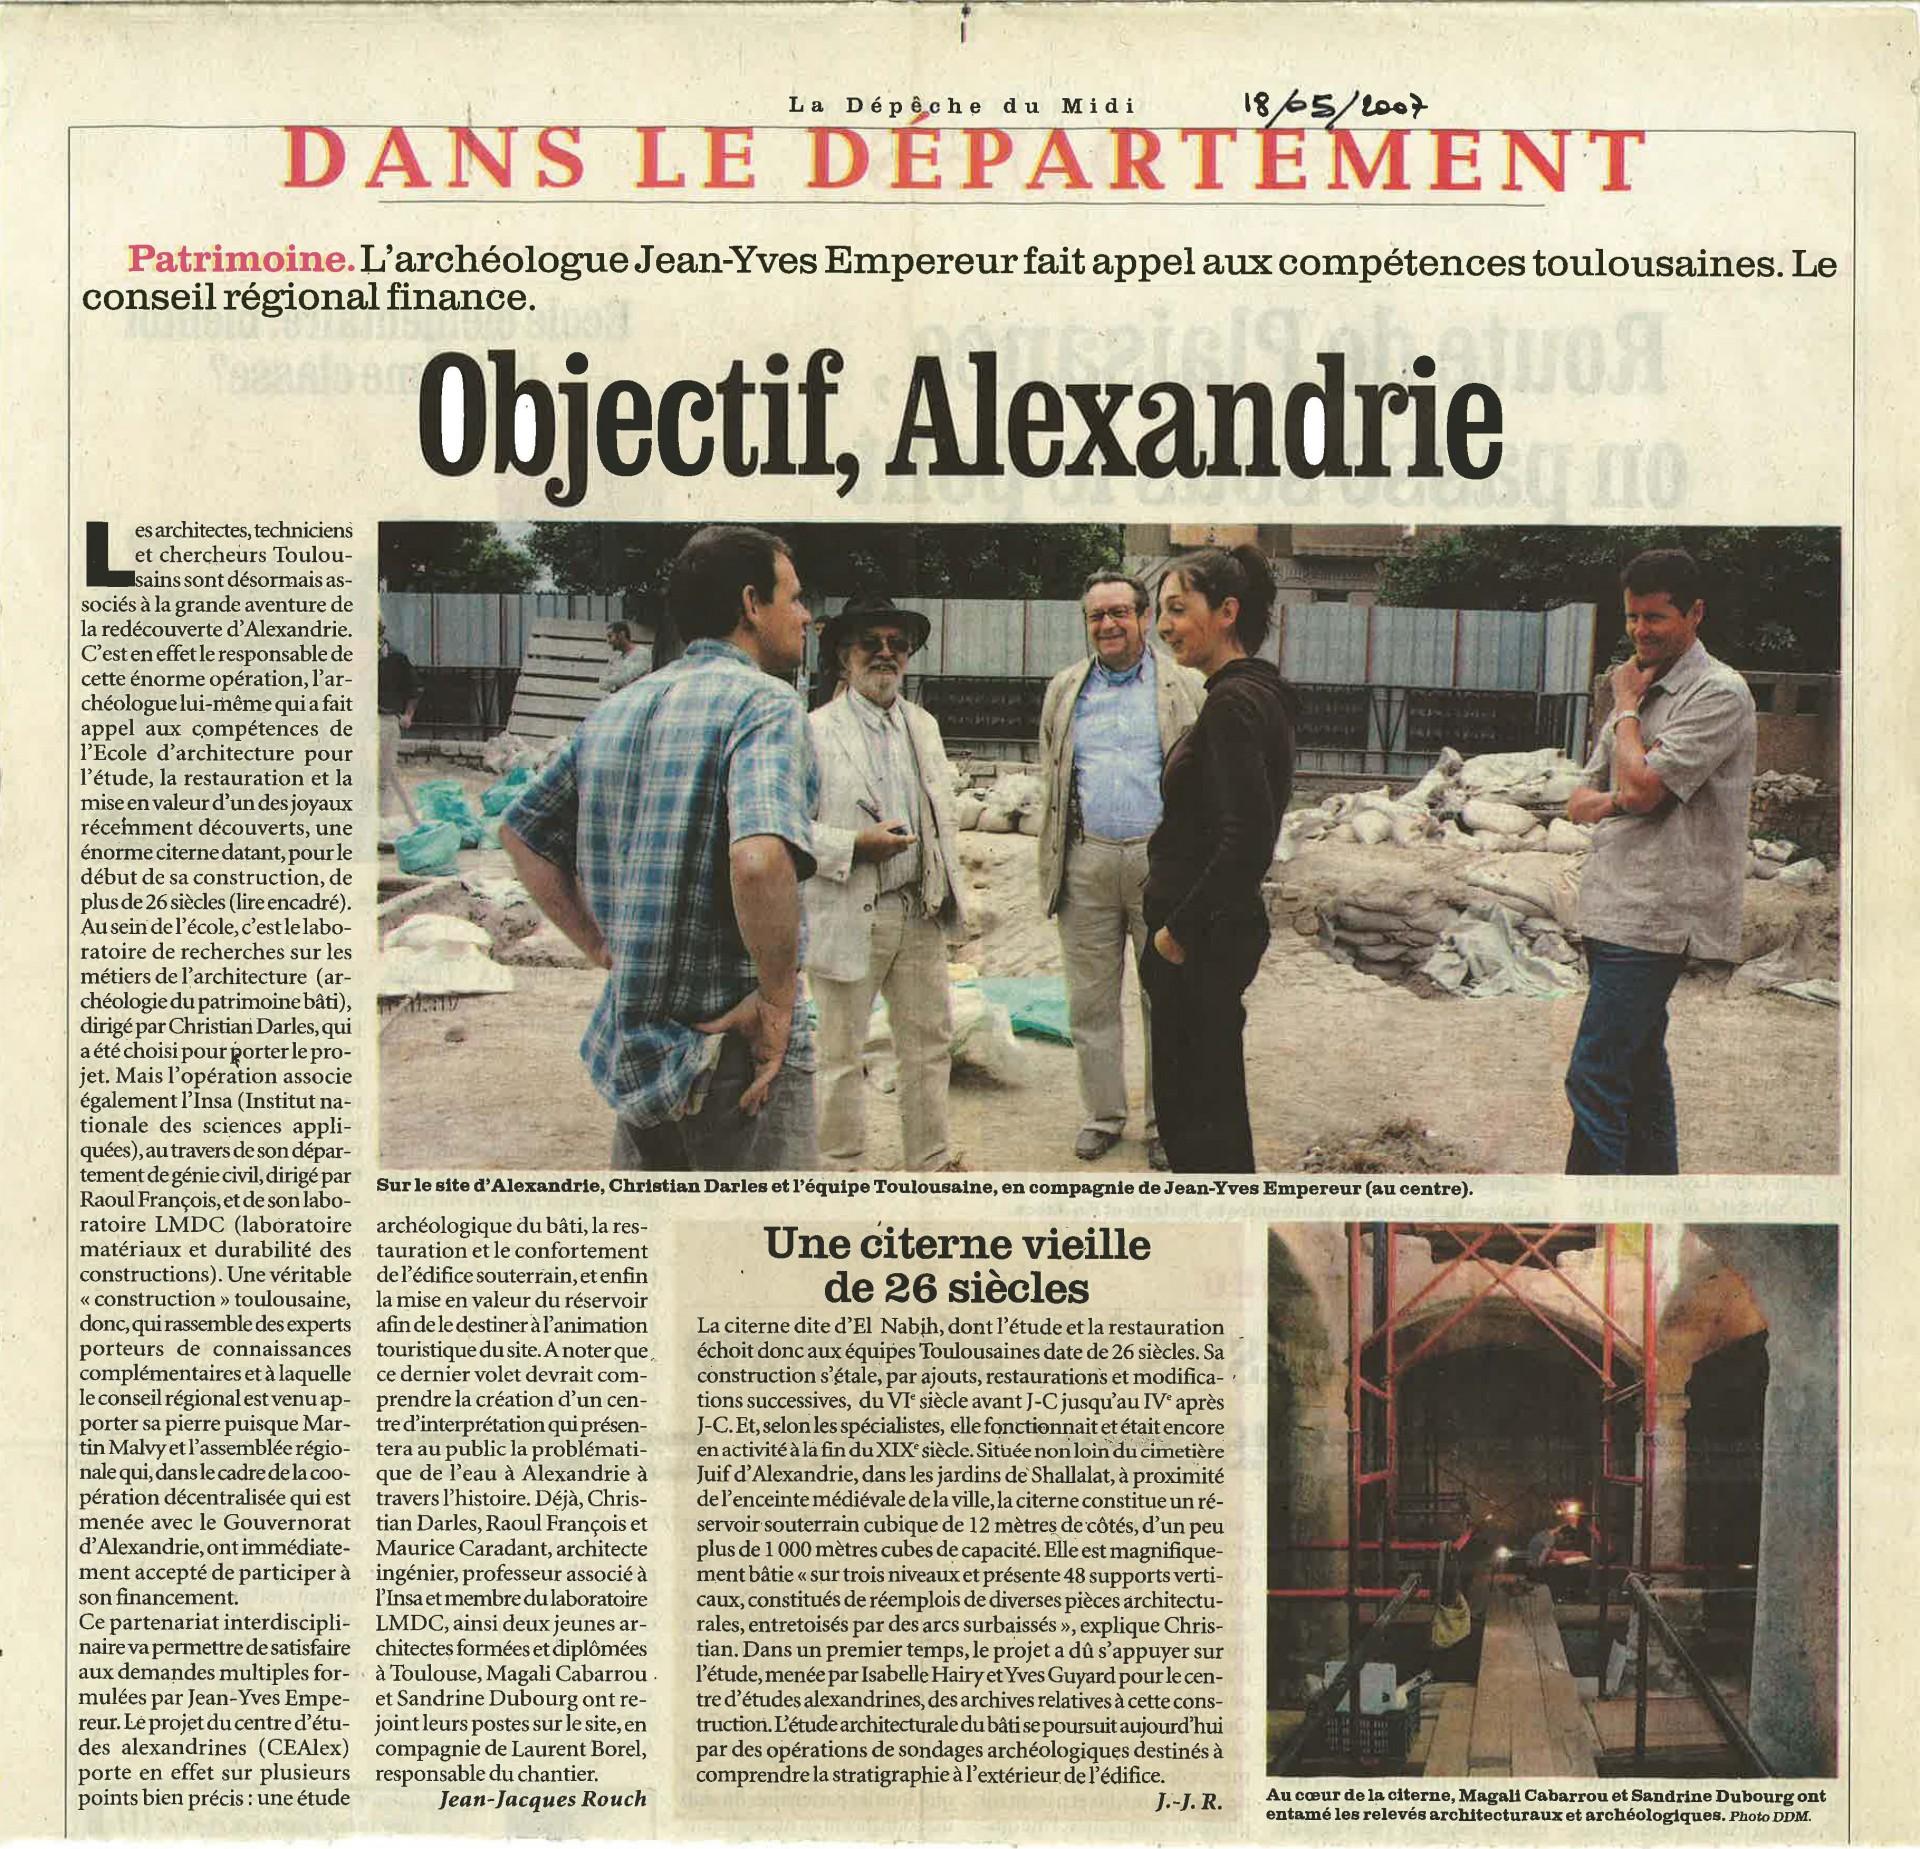 Objectif Alexandrie